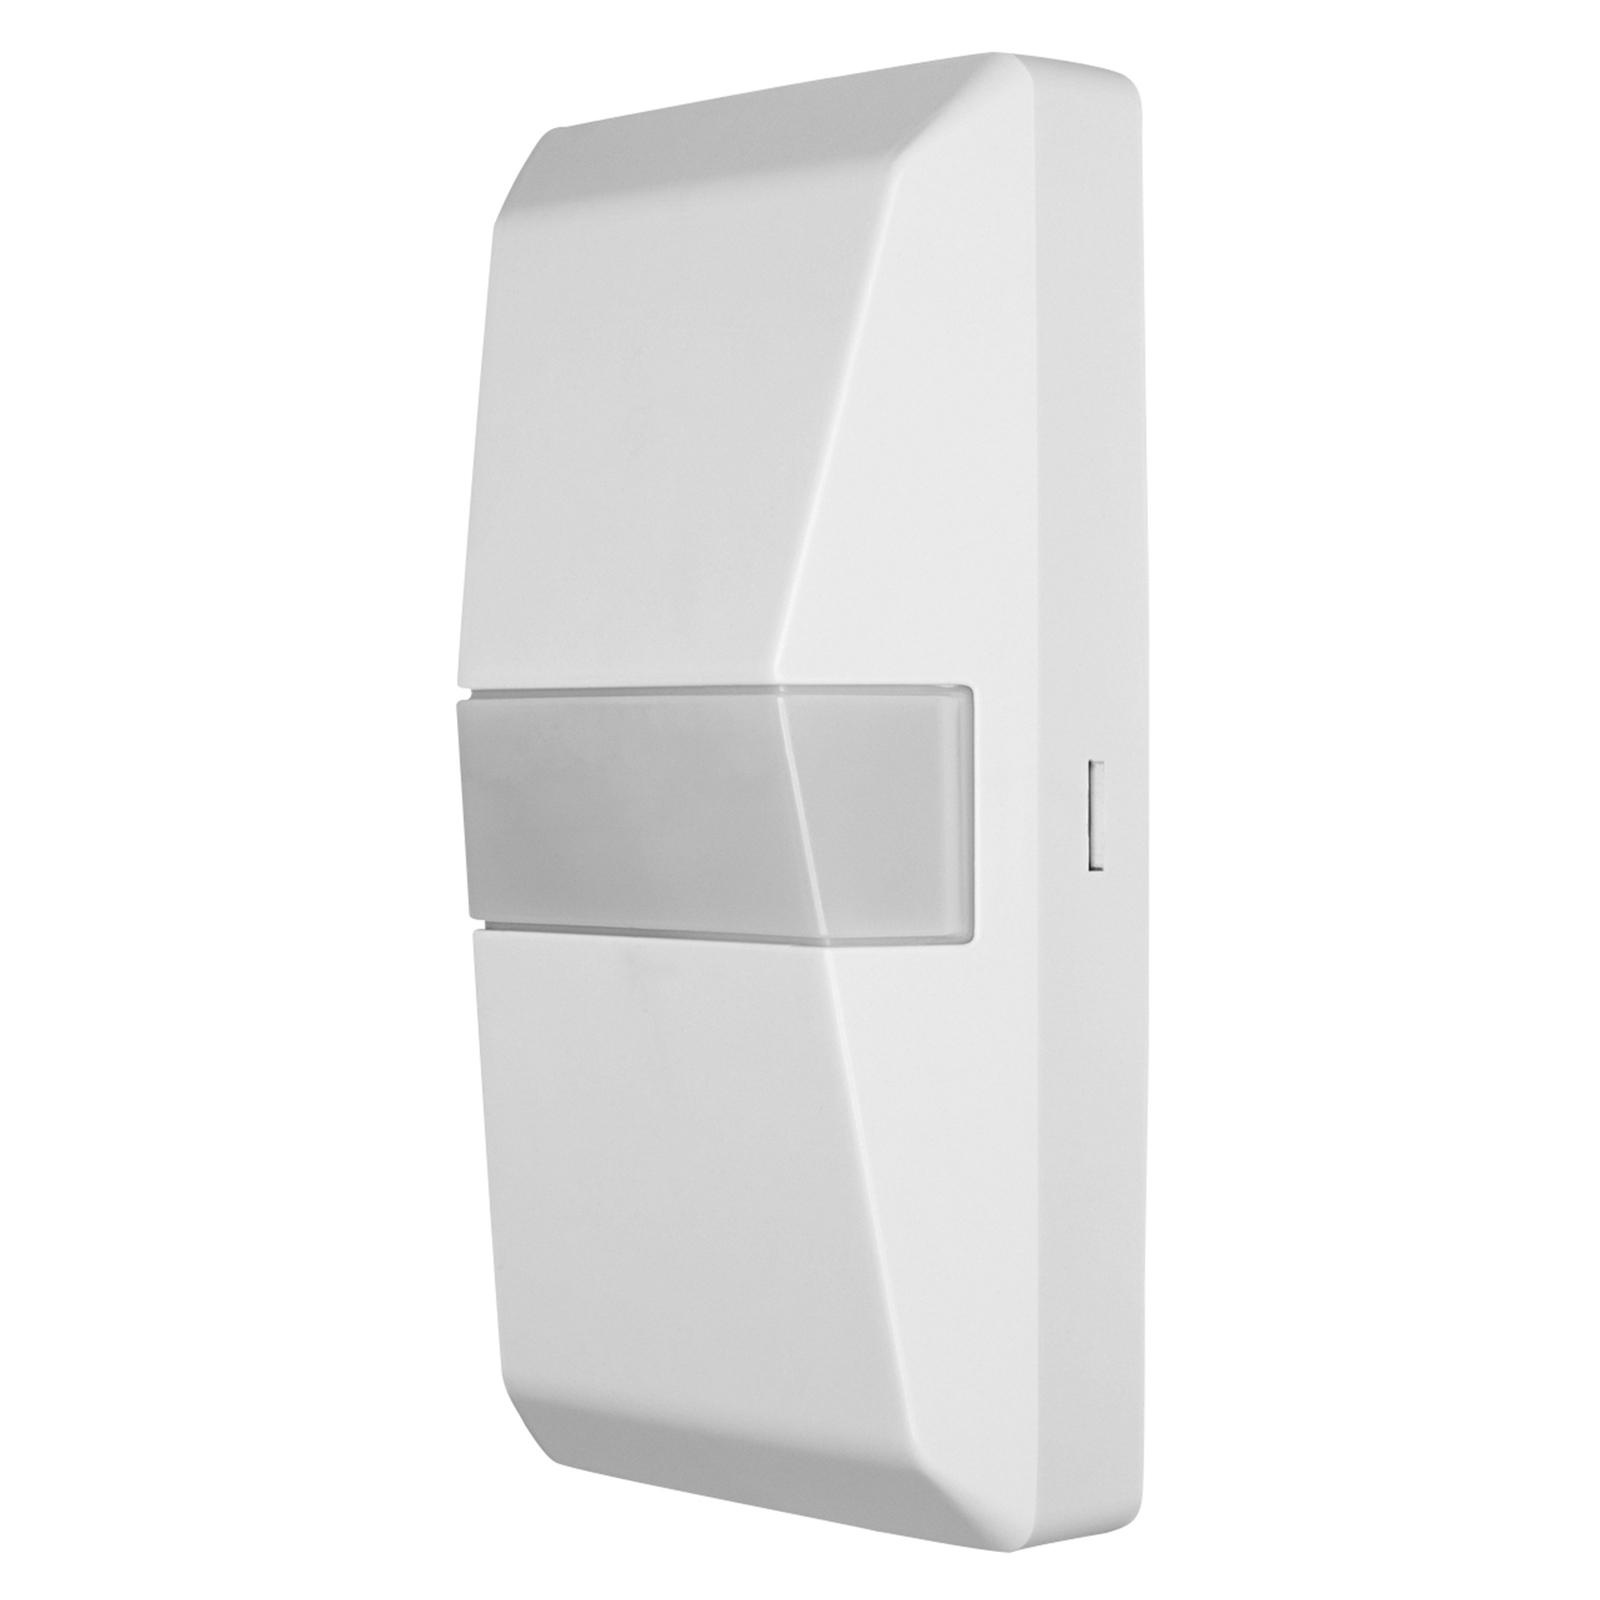 LEDVANCE Endura Pro UpDown Sensor valkoinen